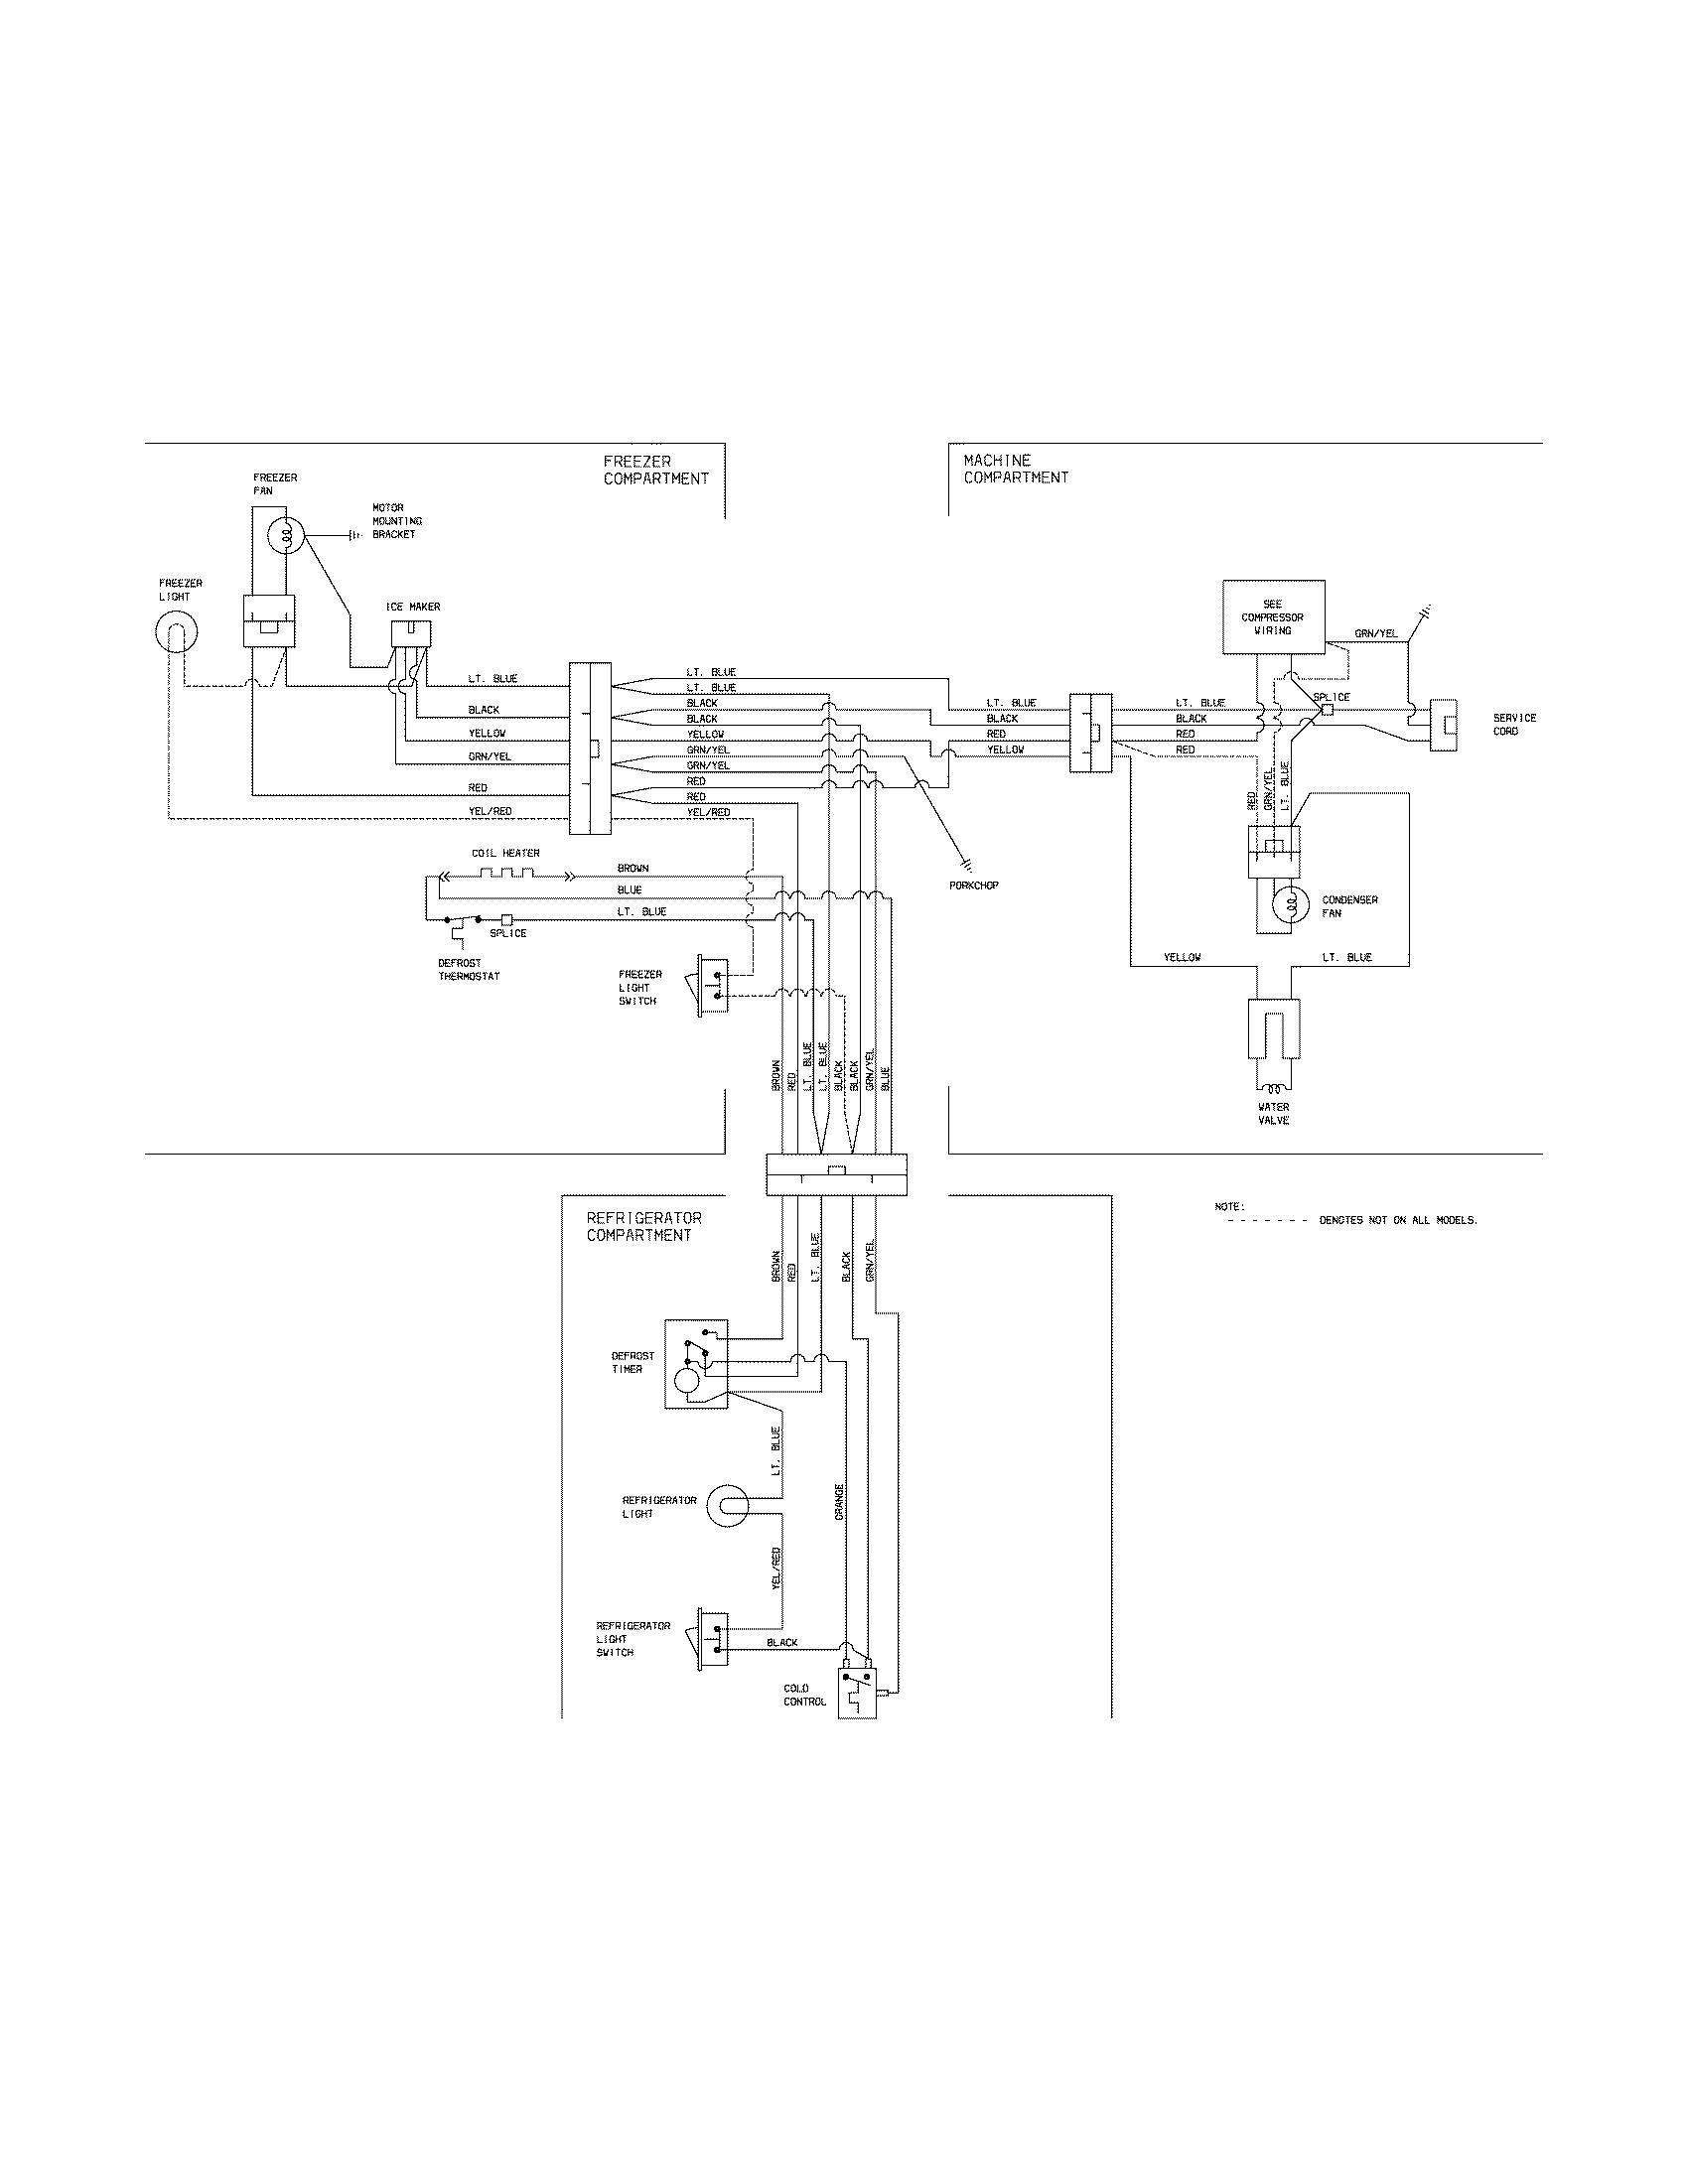 frigidaire wiring diagram chevy hei refrigerator ice maker parts model